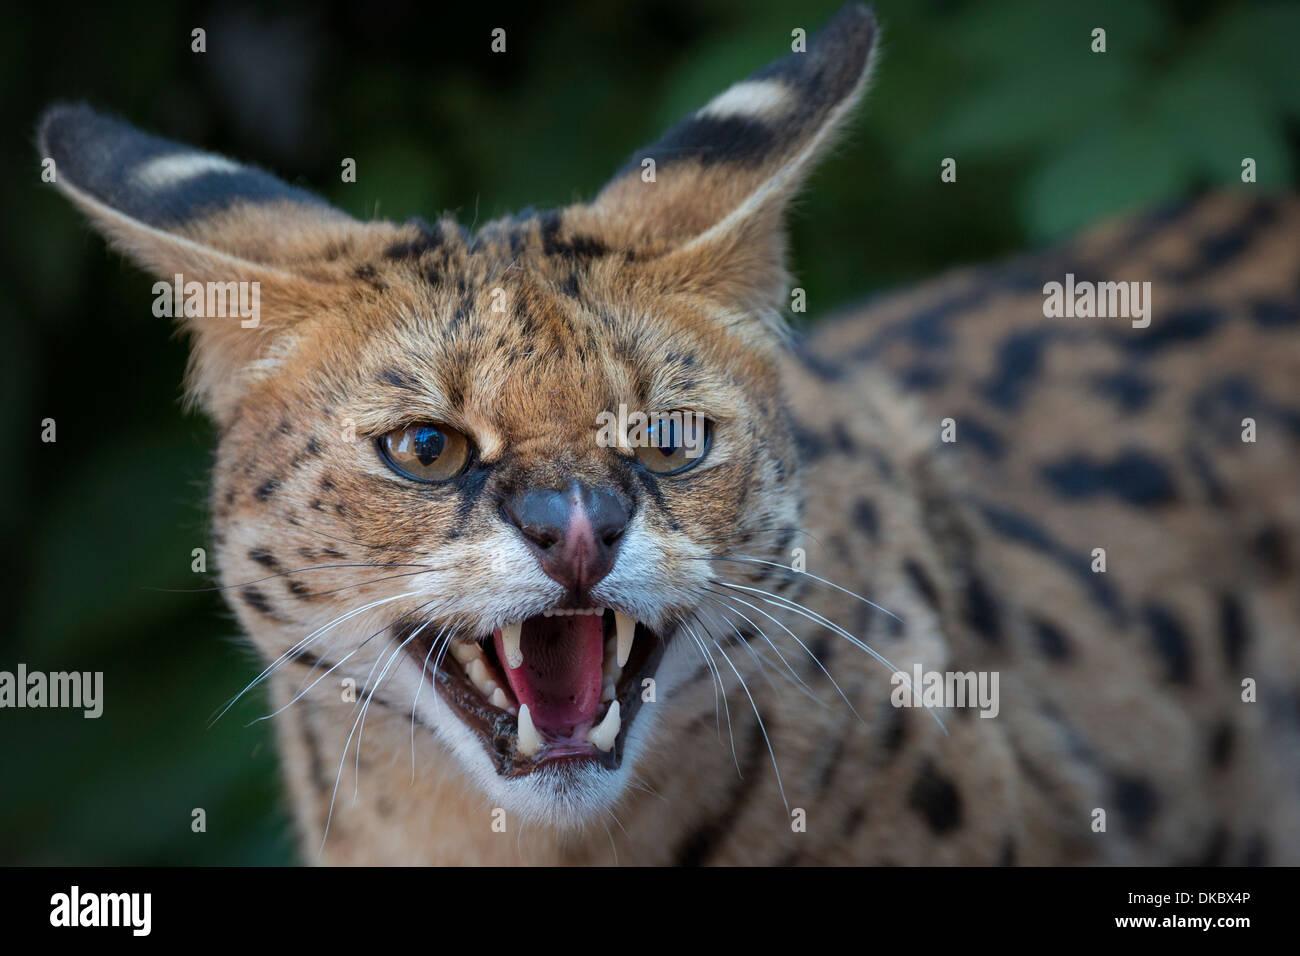 Snarling Serval. - Stock Image